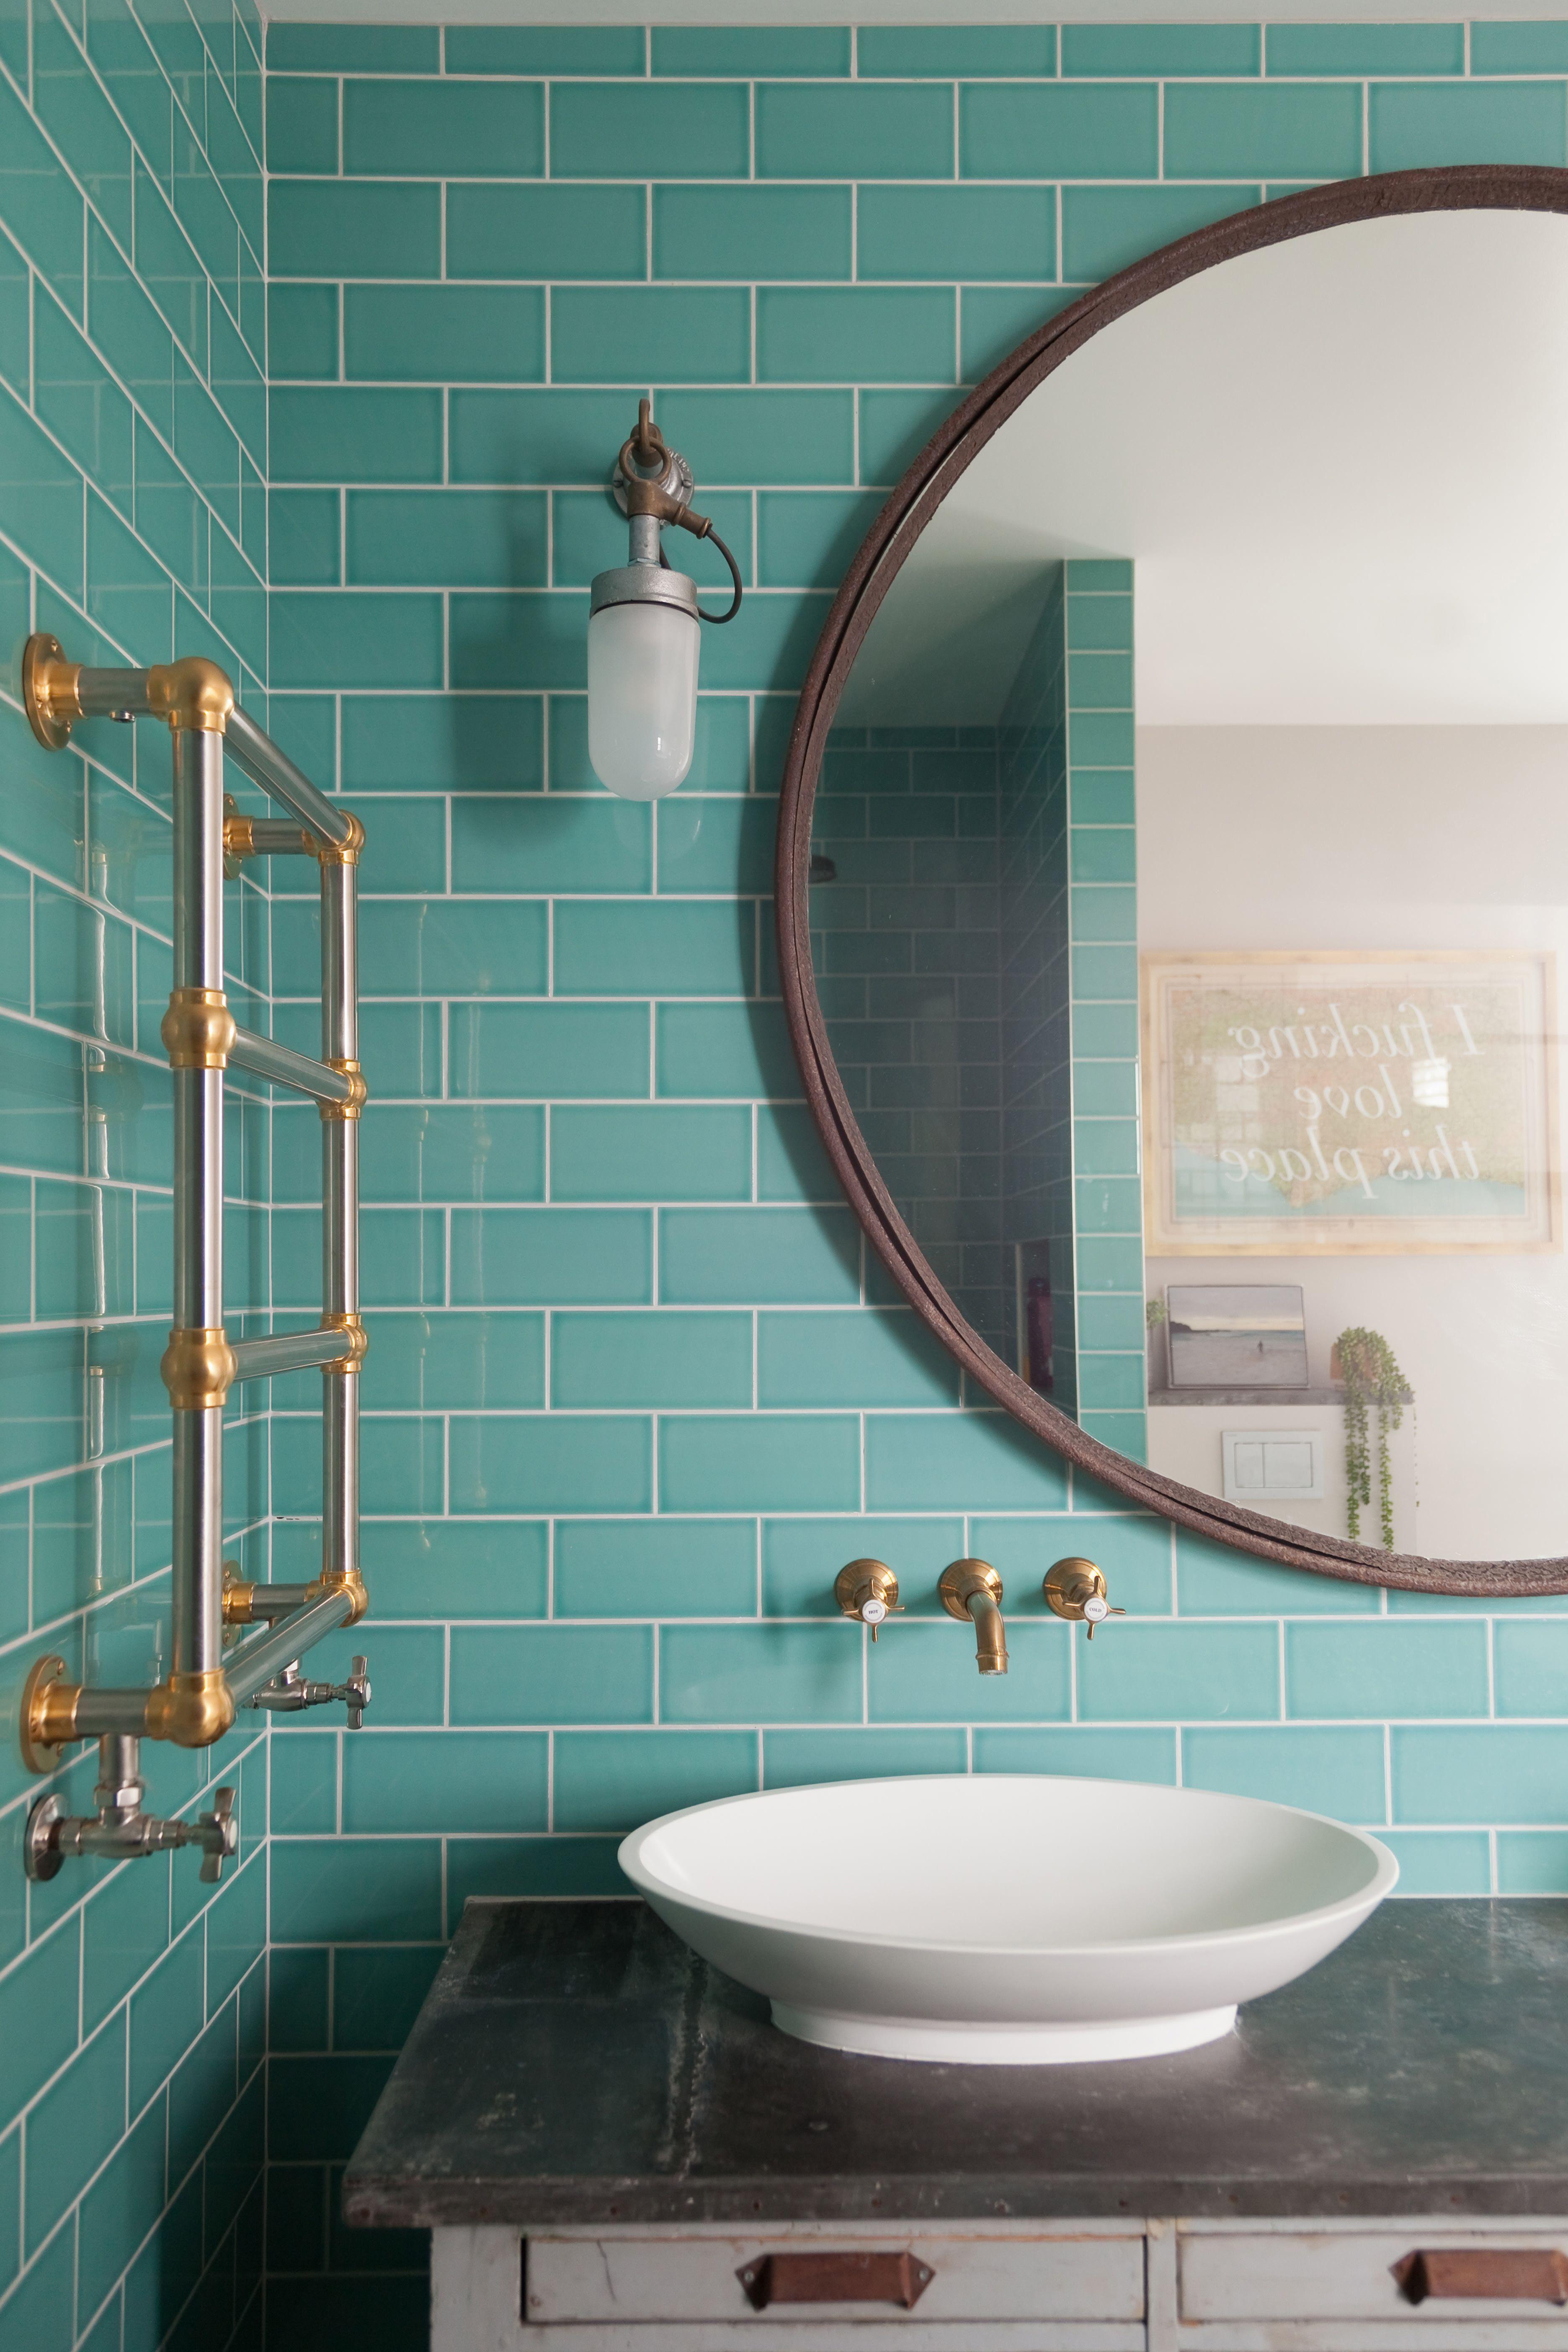 2lg Studio St Albans England Edwardian Cottage Home Tour Bathroom Tile Designs Turquoise Bathroom Retro Bathrooms